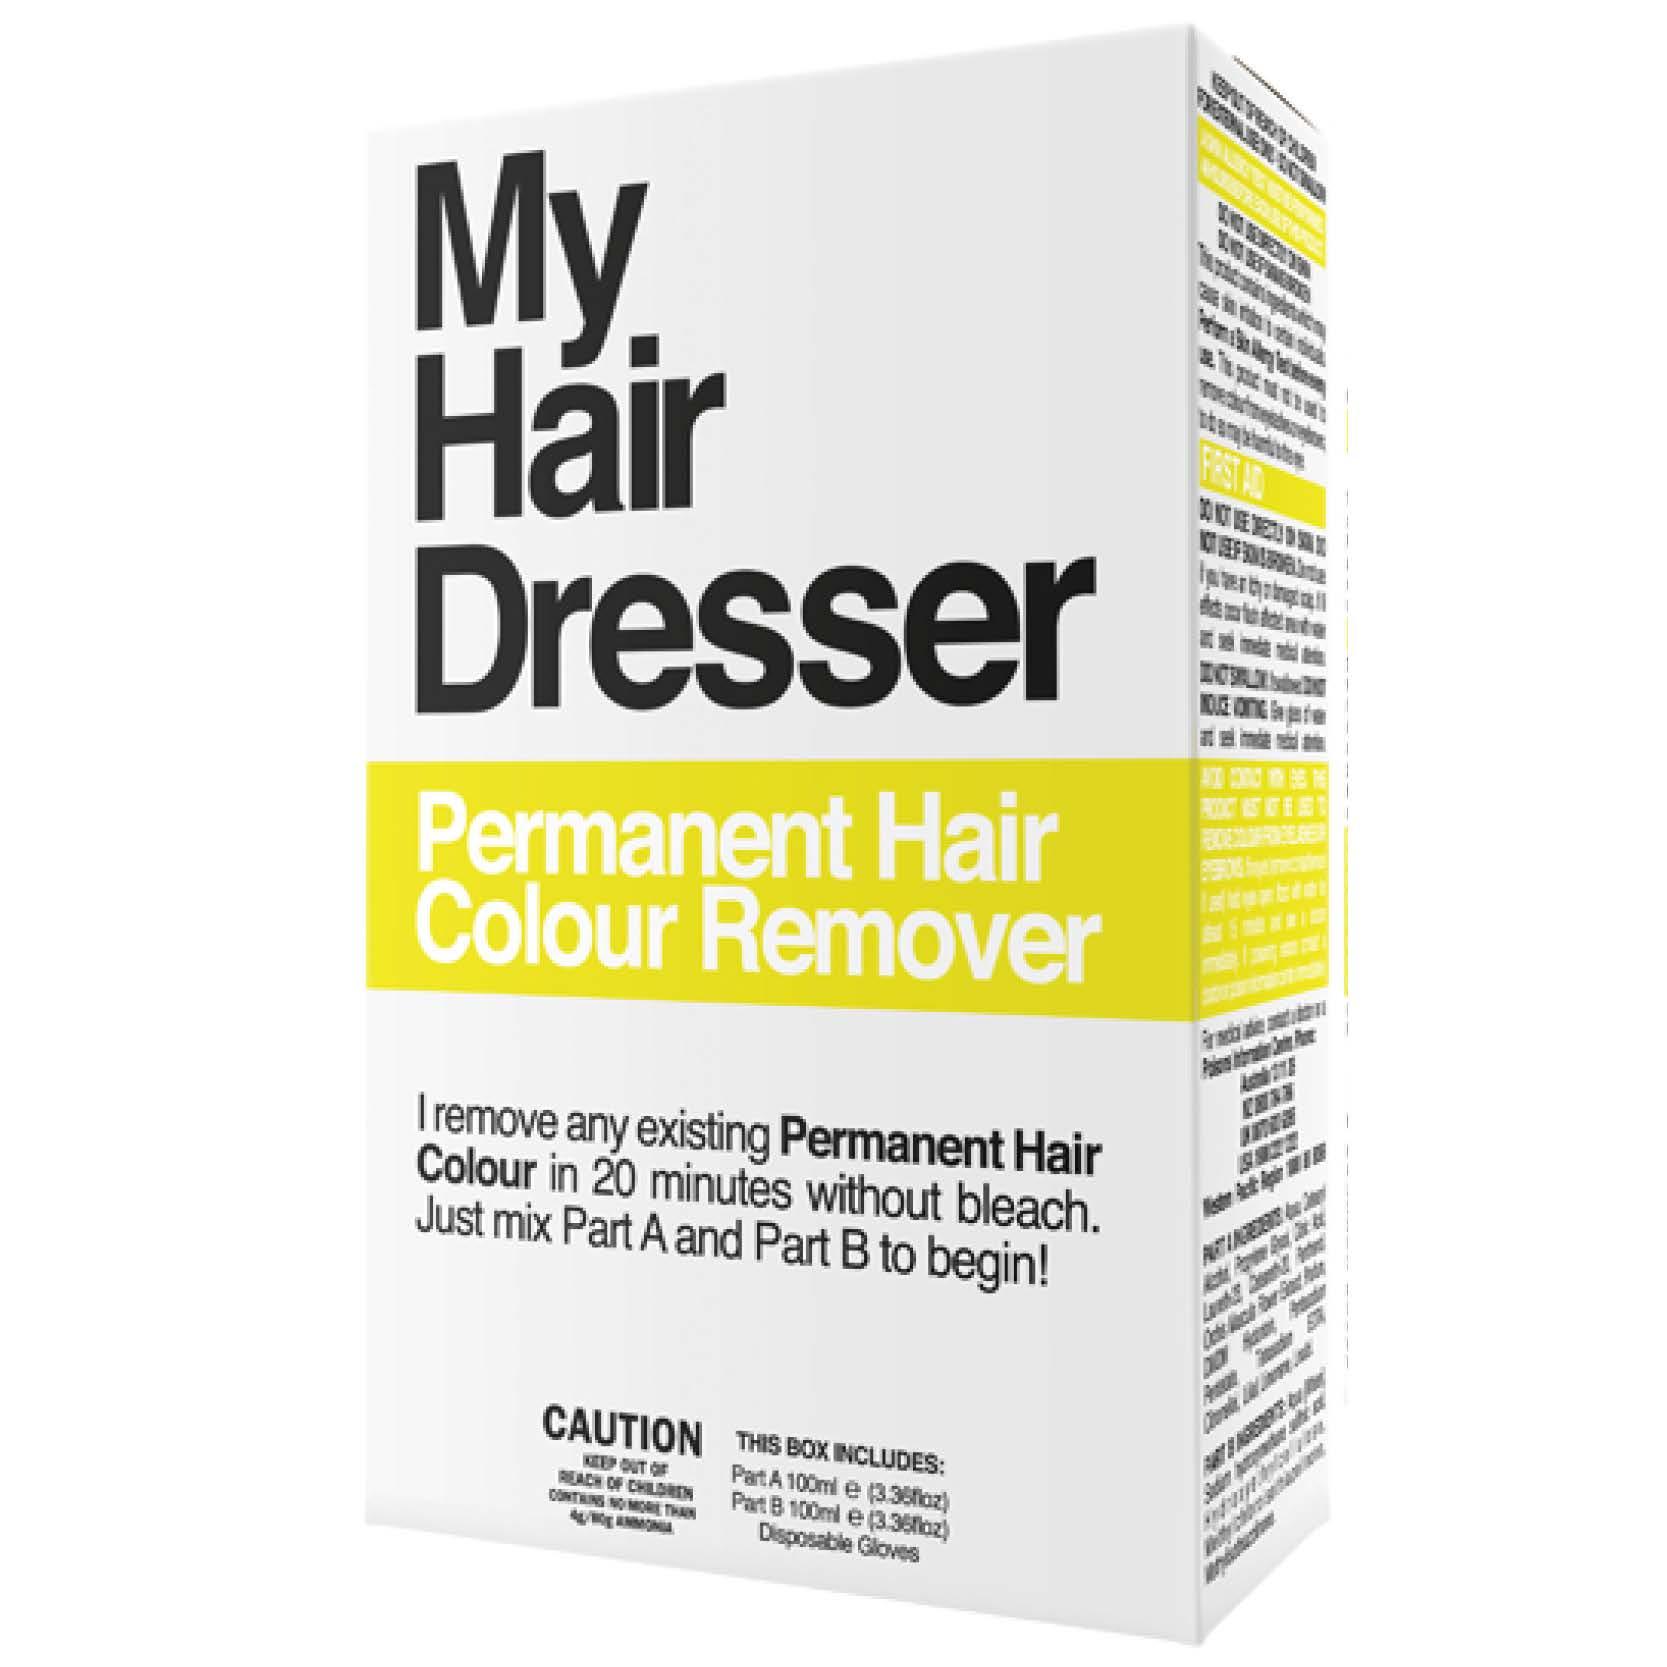 My hairdresser permanent hair colour remover 2 x 100ml life my hairdresser permanent hair colour remover 2 x 100ml solutioingenieria Choice Image